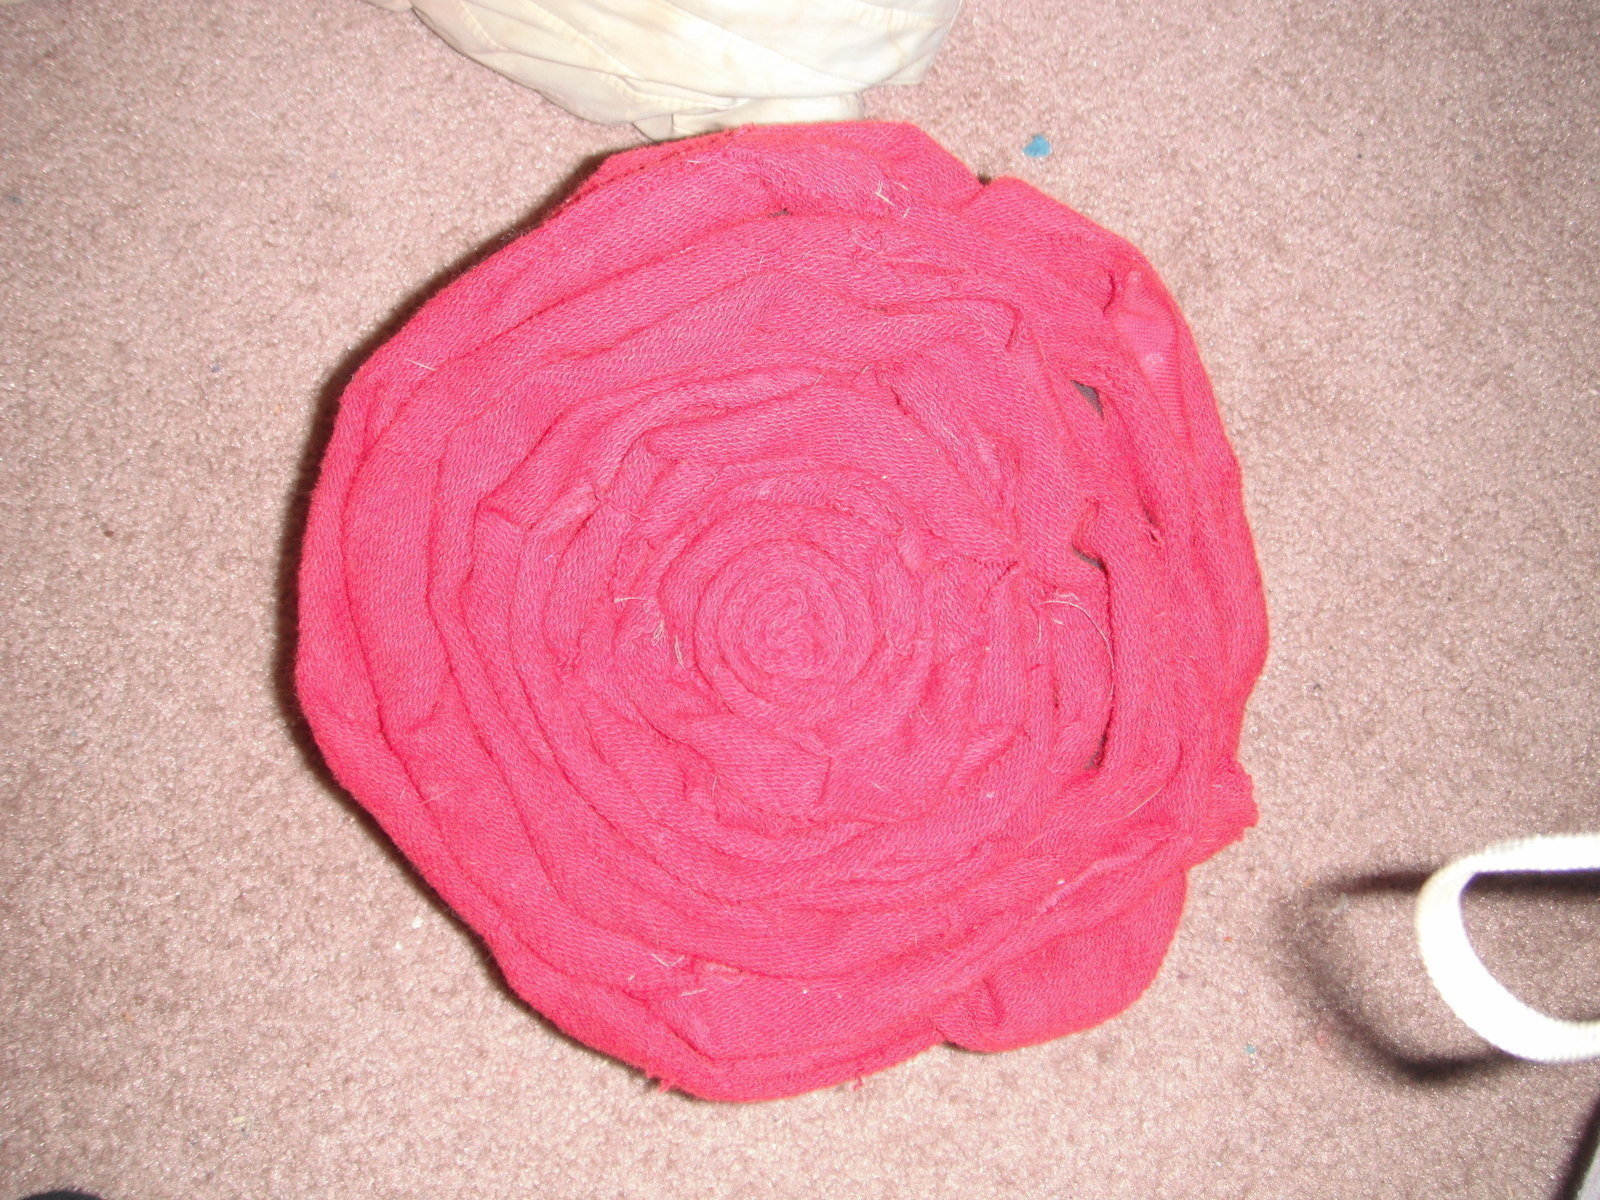 Rose Throw Pillows  A Shaped Cushion  Needlework on Cut